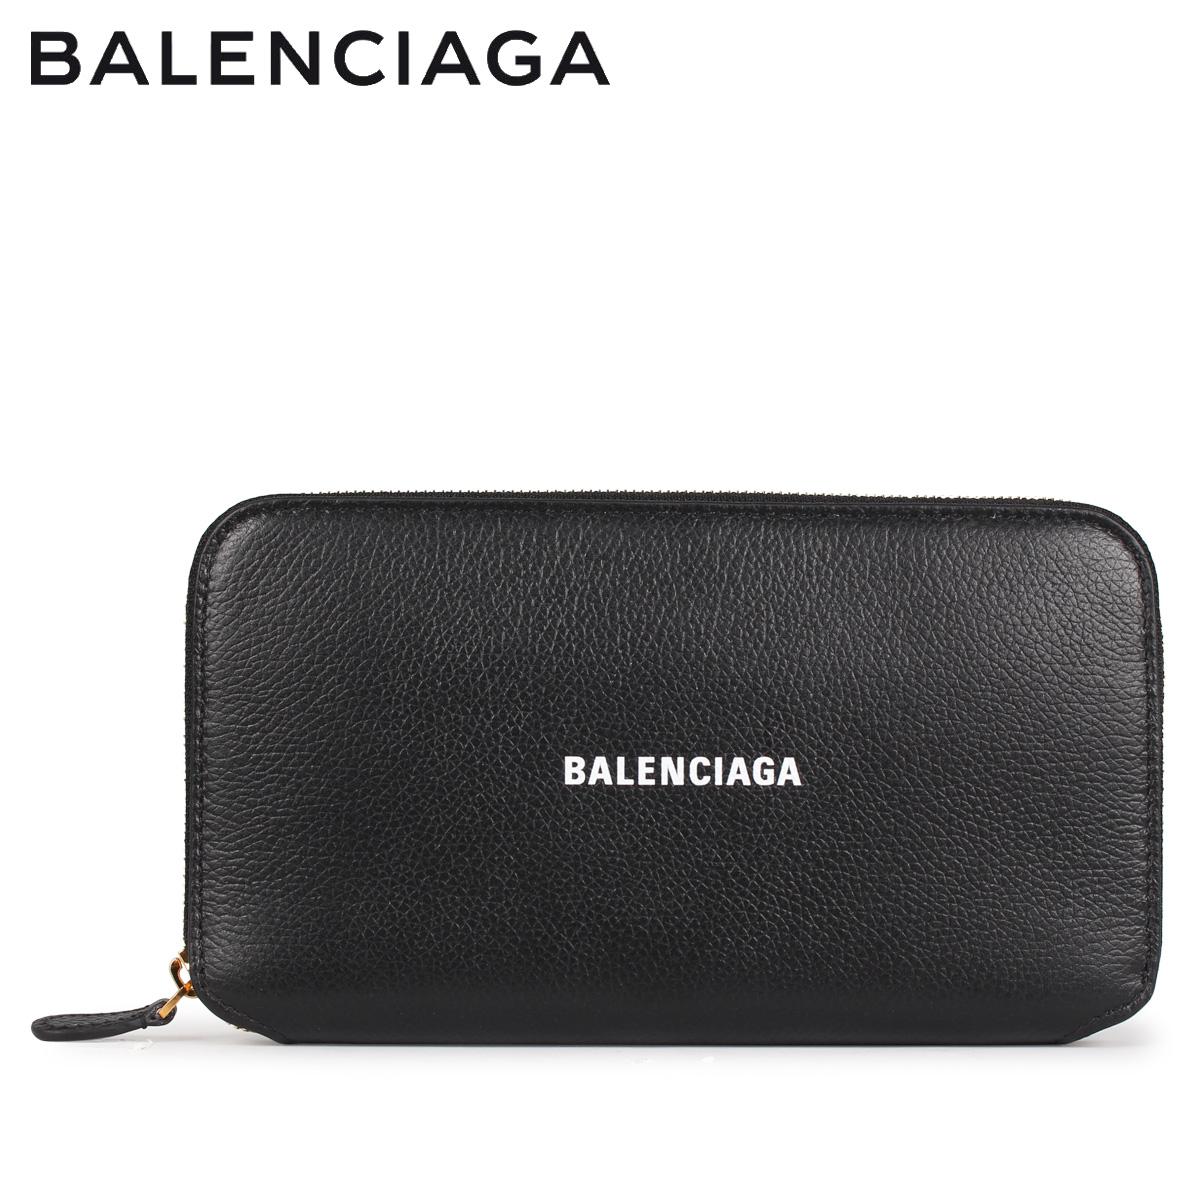 BALENCIAGA バレンシアガ 財布 長財布 メンズ レディース ラウンドファスナー ZIP AROUND WALLET ブラック 黒 594290 [4/14 新入荷]